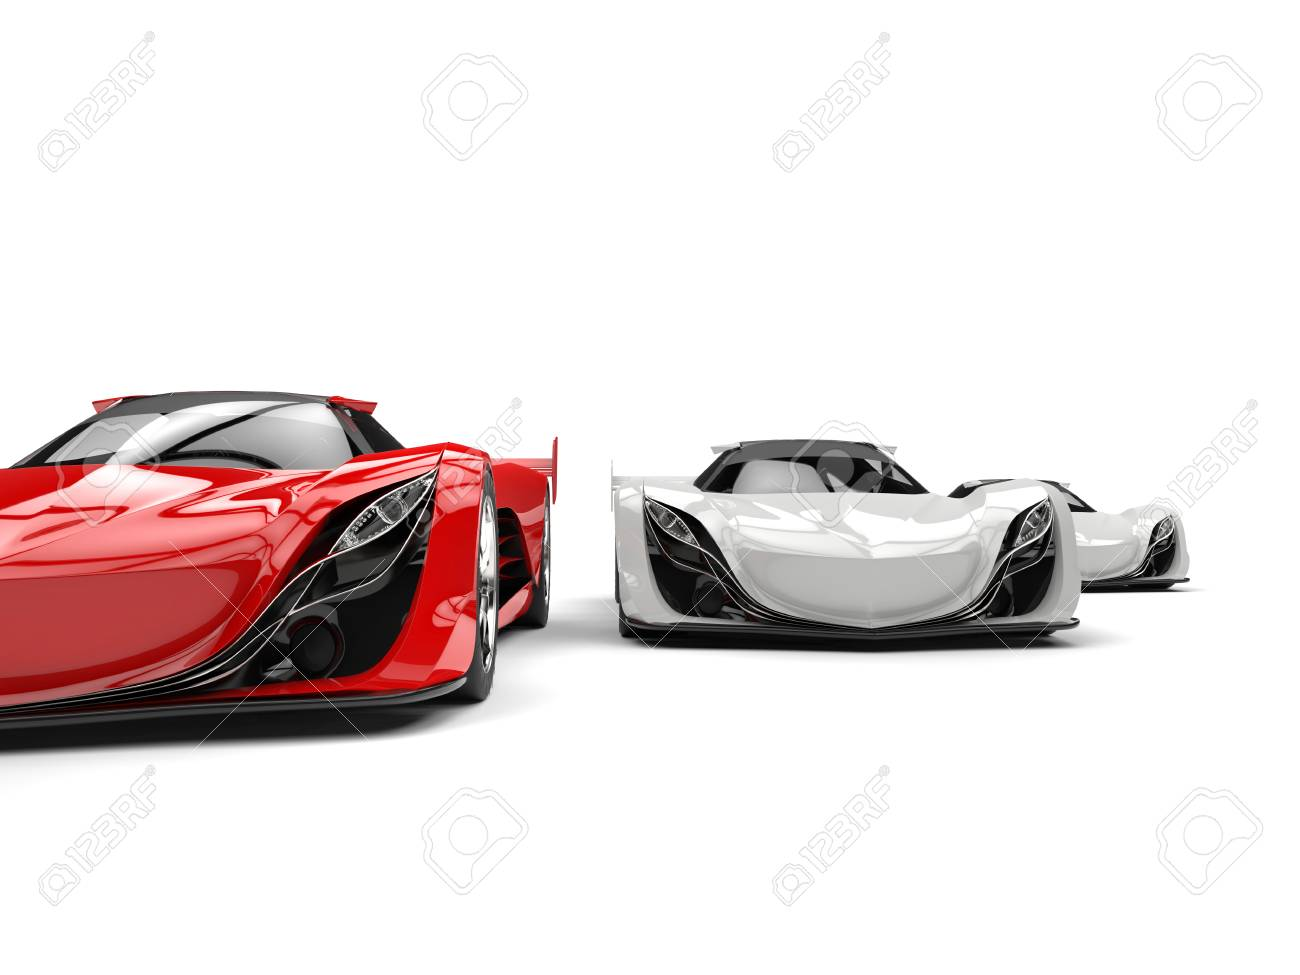 Crimson Red And White Futuristic Concept Sports Cars   Cut Shot Stock Photo    80398255